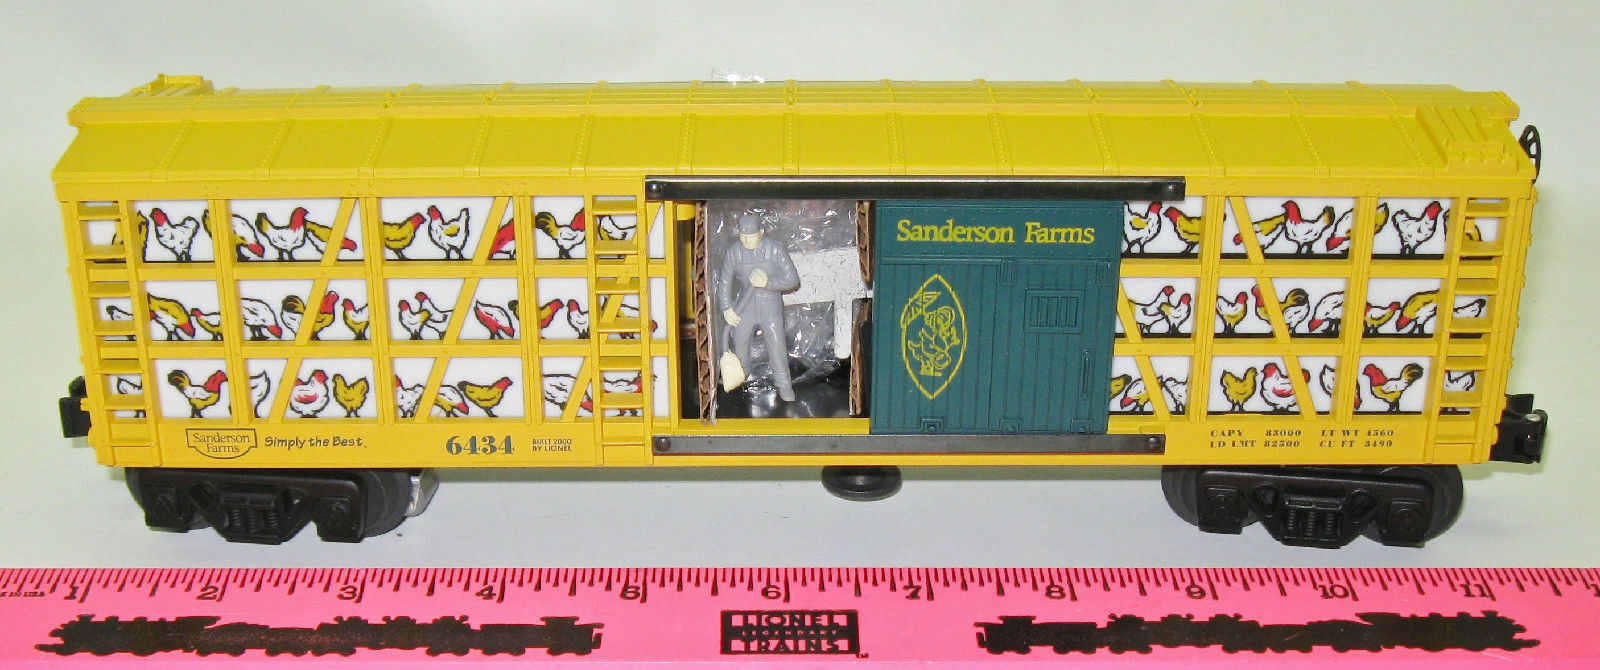 Lionel New 6-19882 Sanderson Frams Poultry car